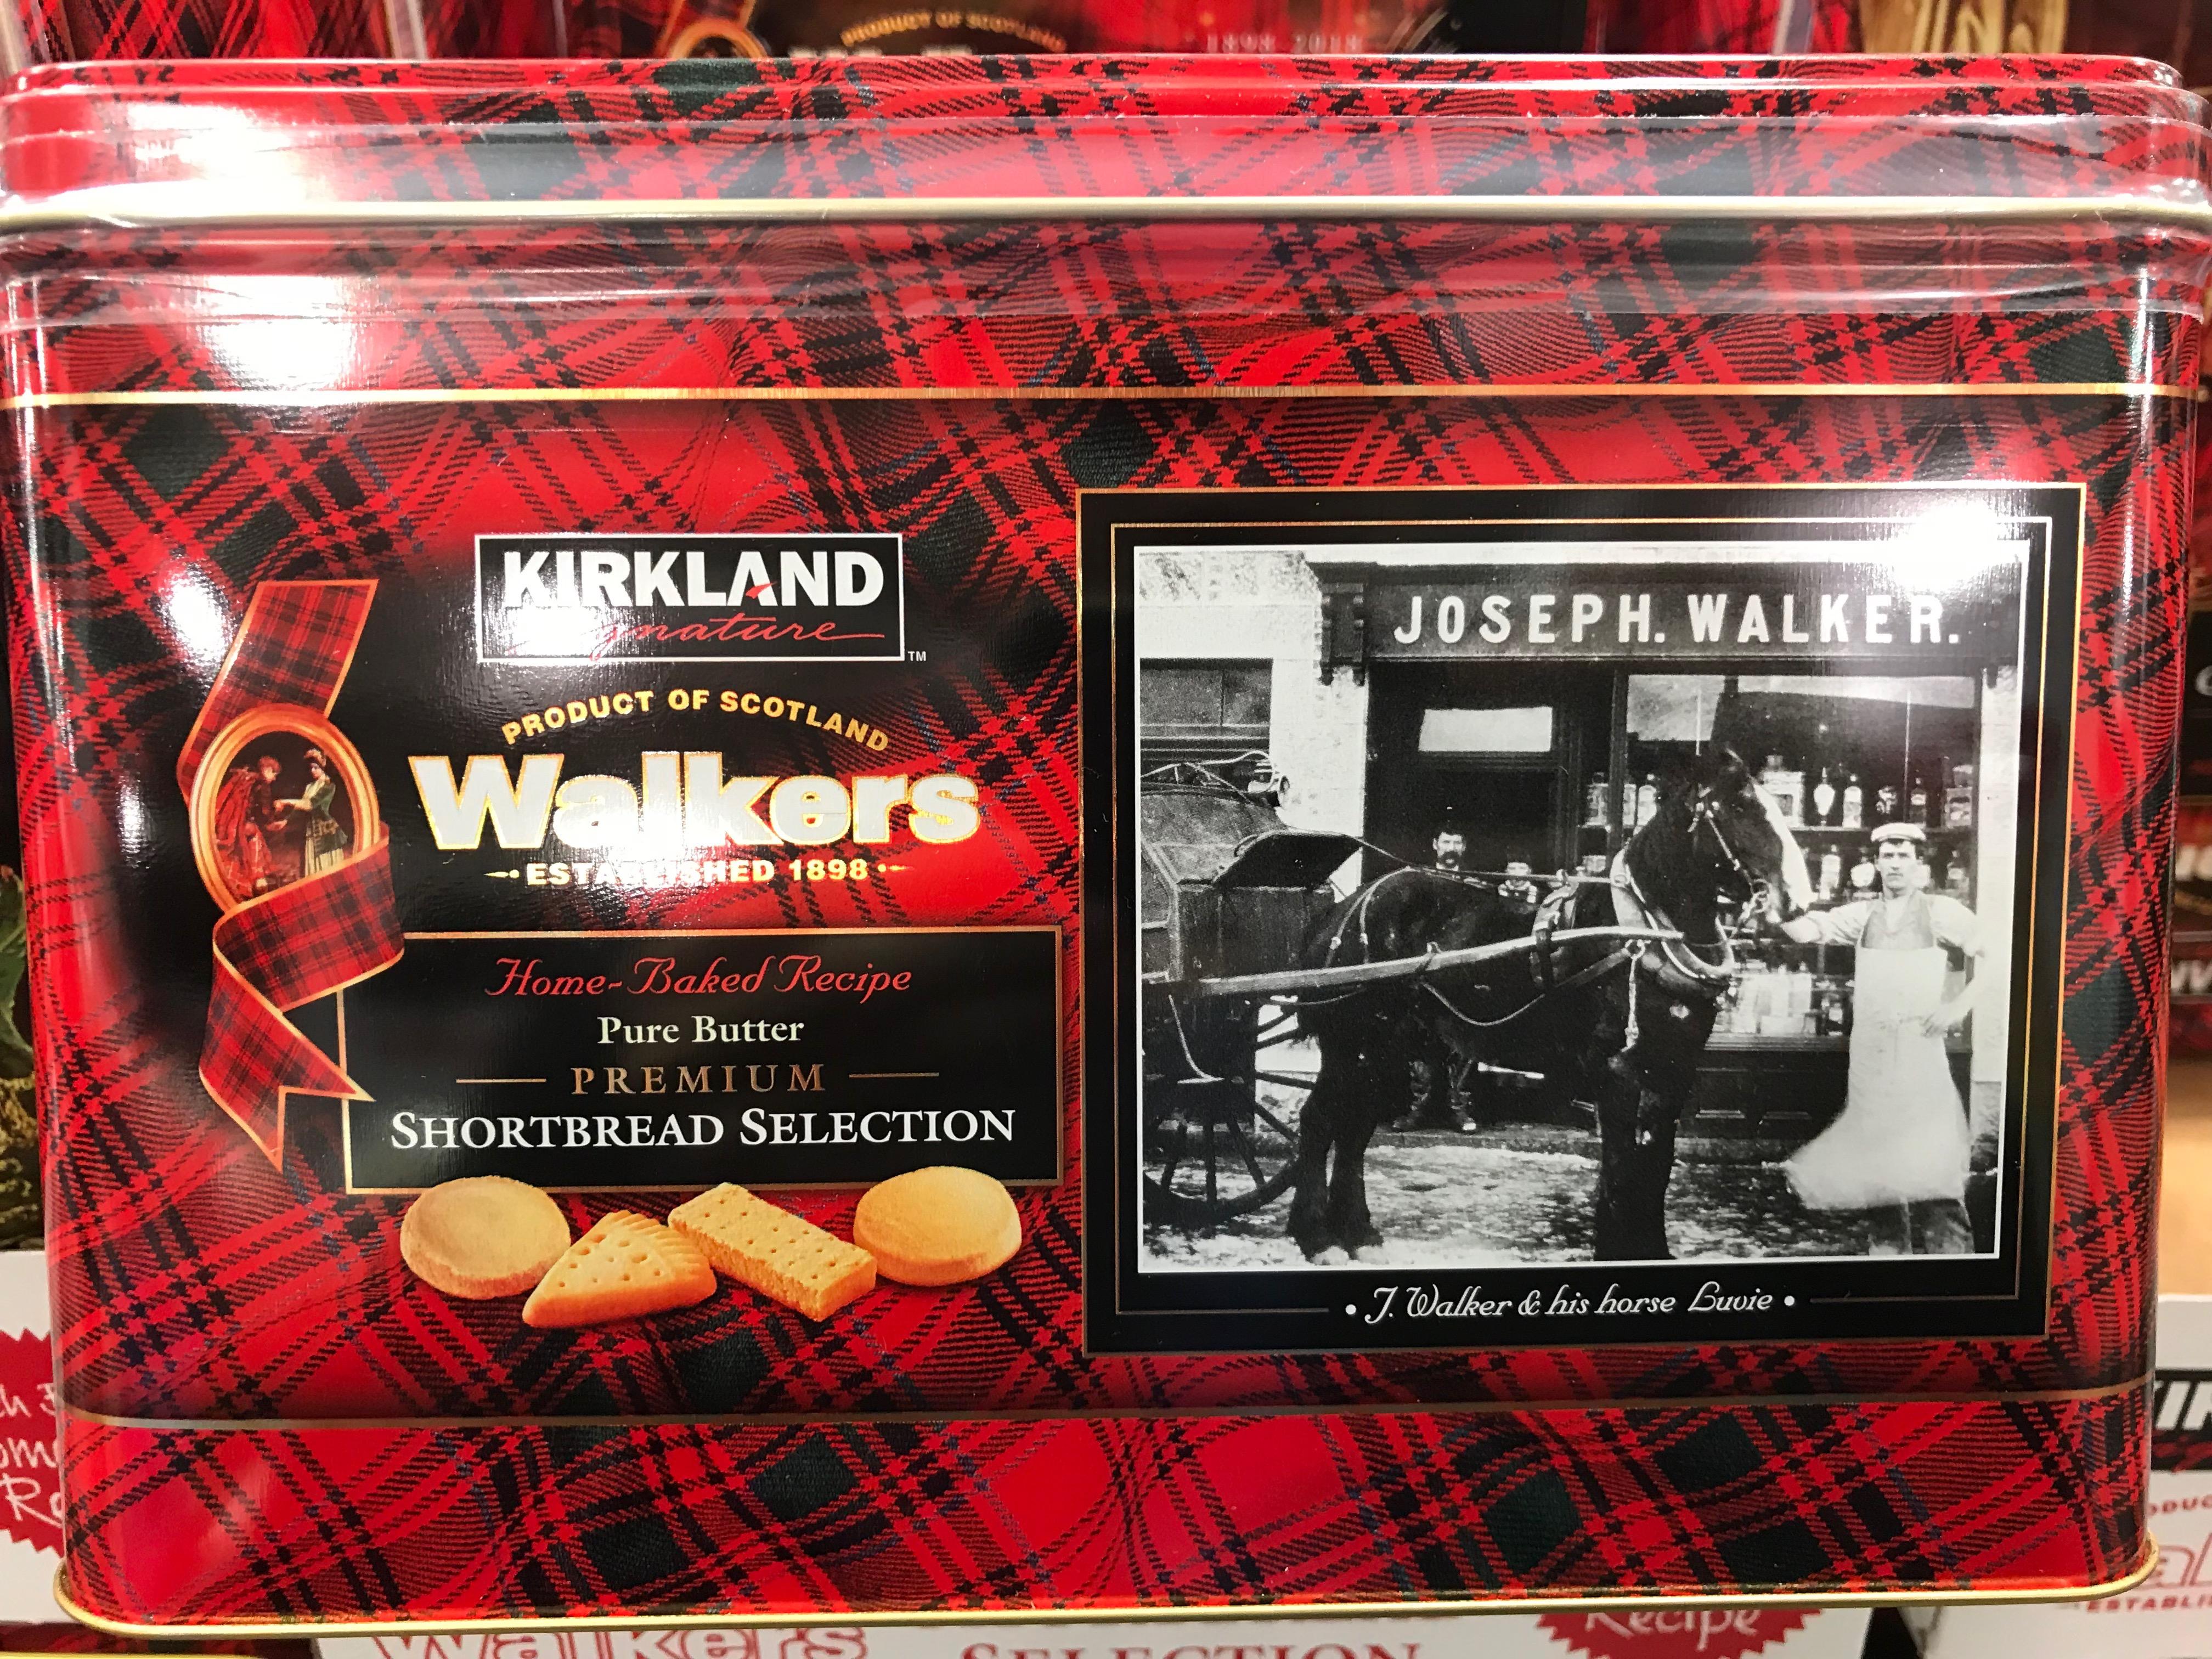 Kirkland Signature Walkers Shortbread Selection Tin Side Panel View